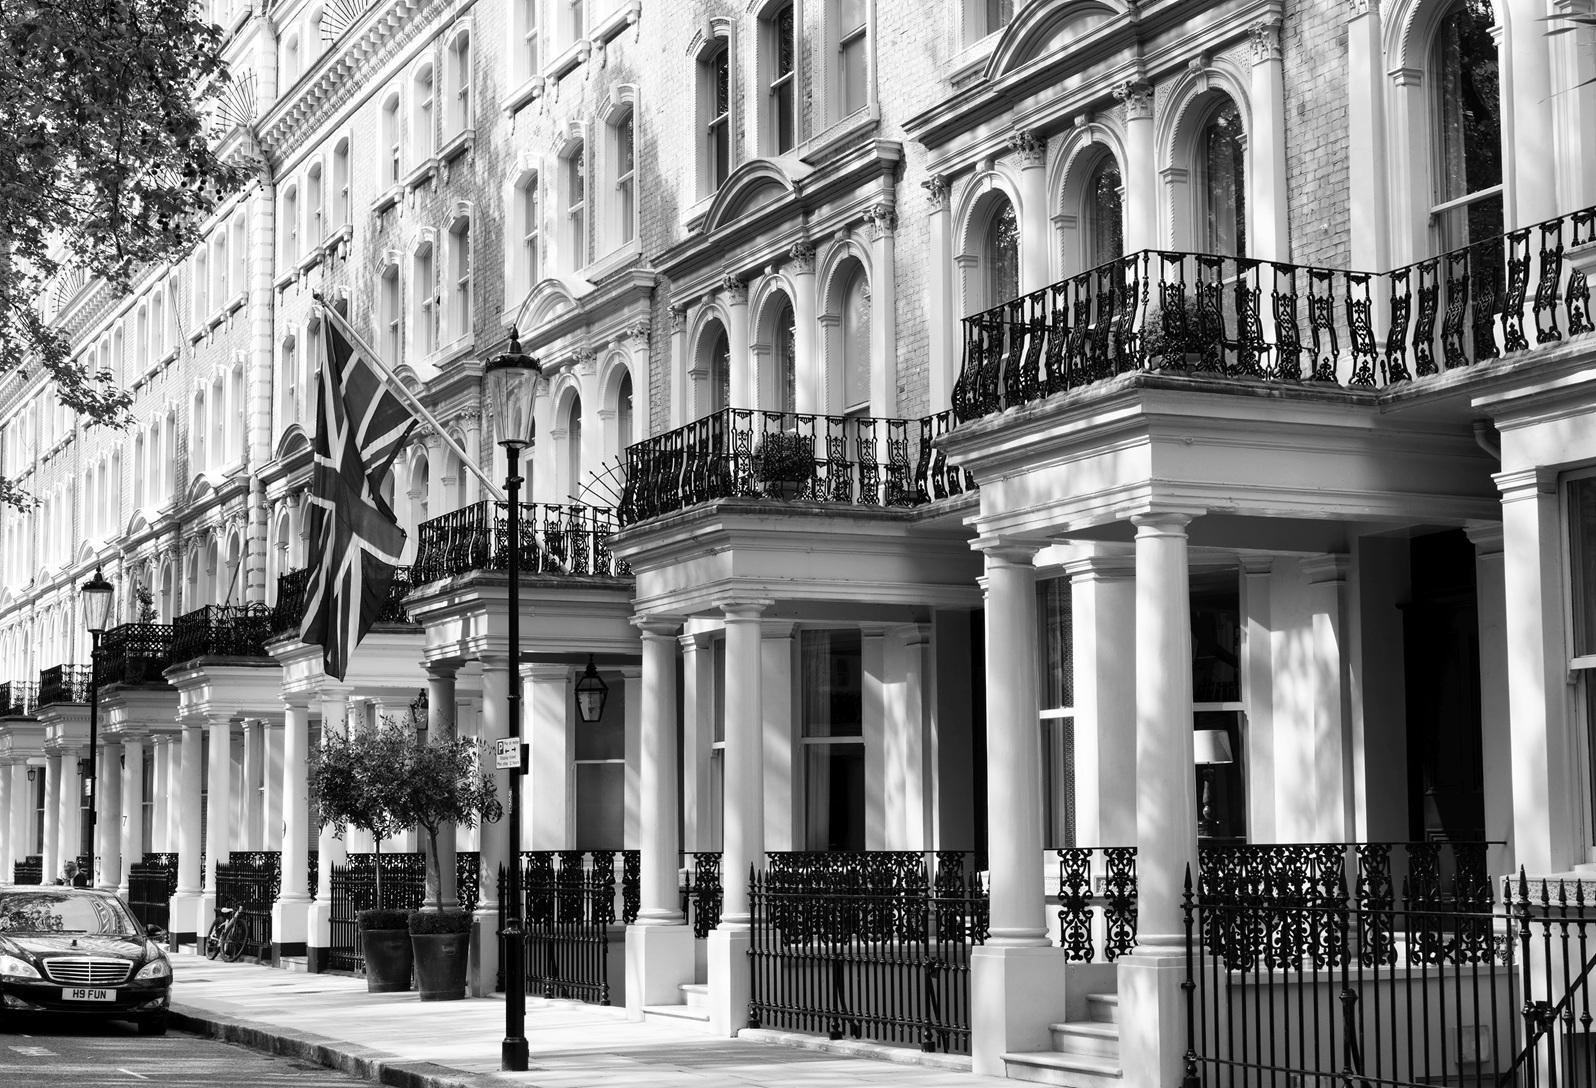 Ibis Hotel Kensington